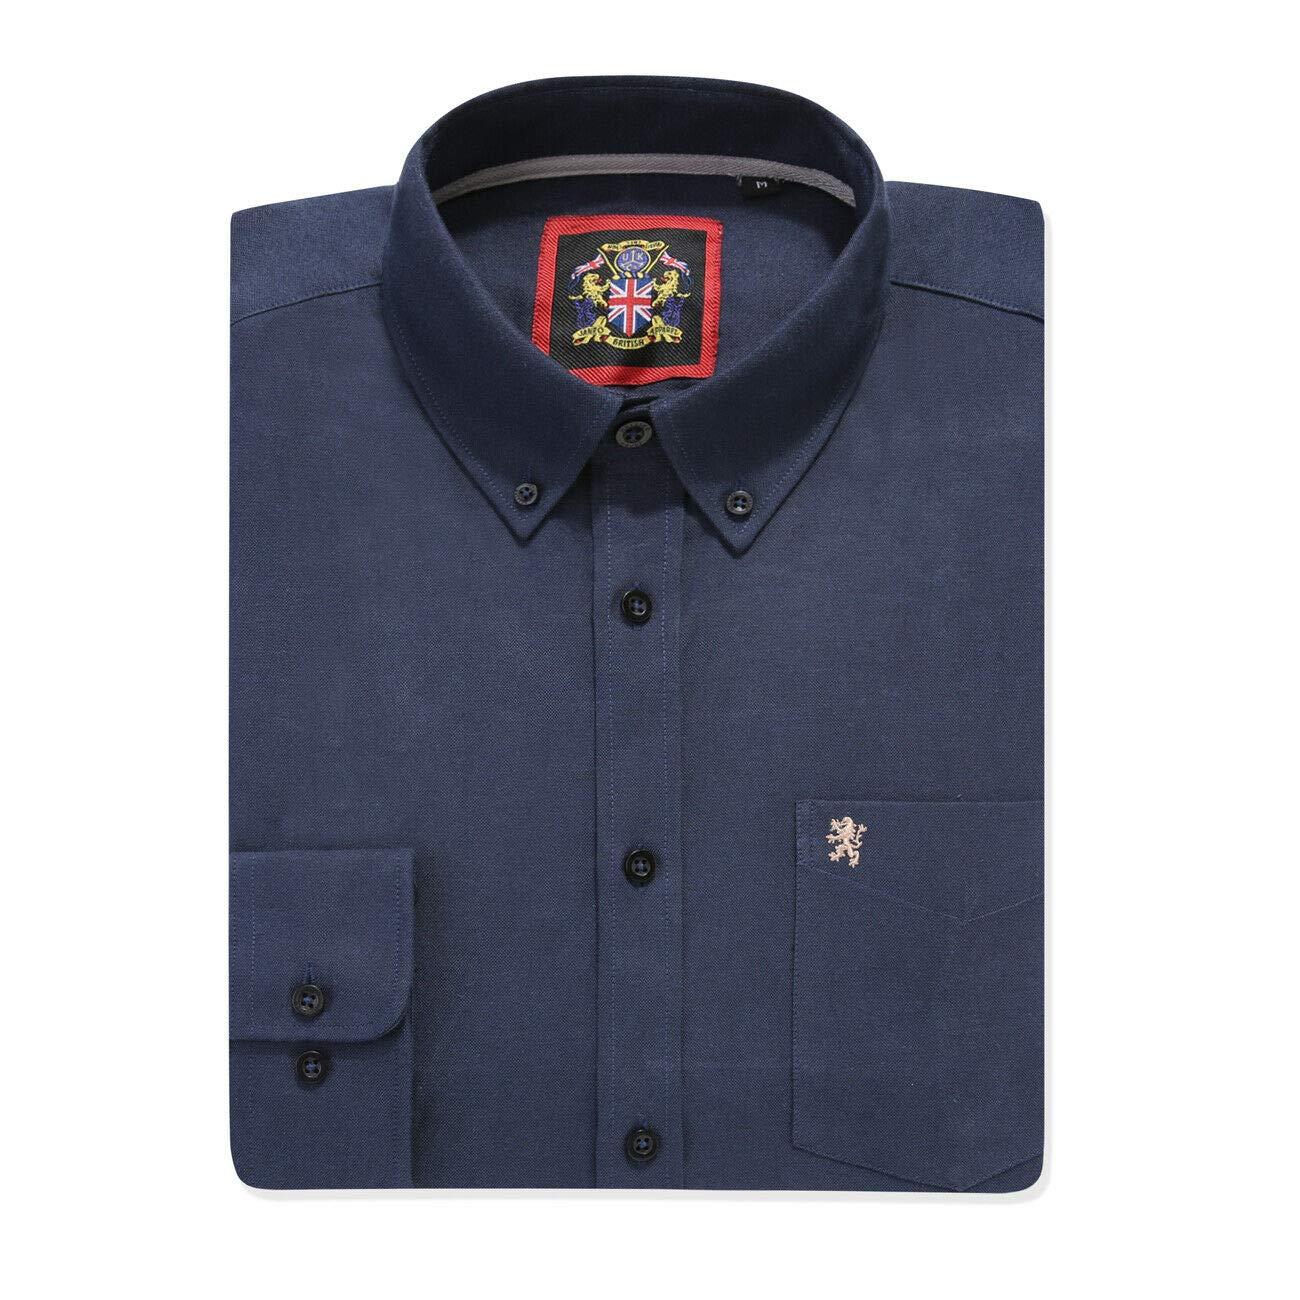 Janeo Mens Shirts - Camisa Formal - para Hombre Azul Azul Marino ...